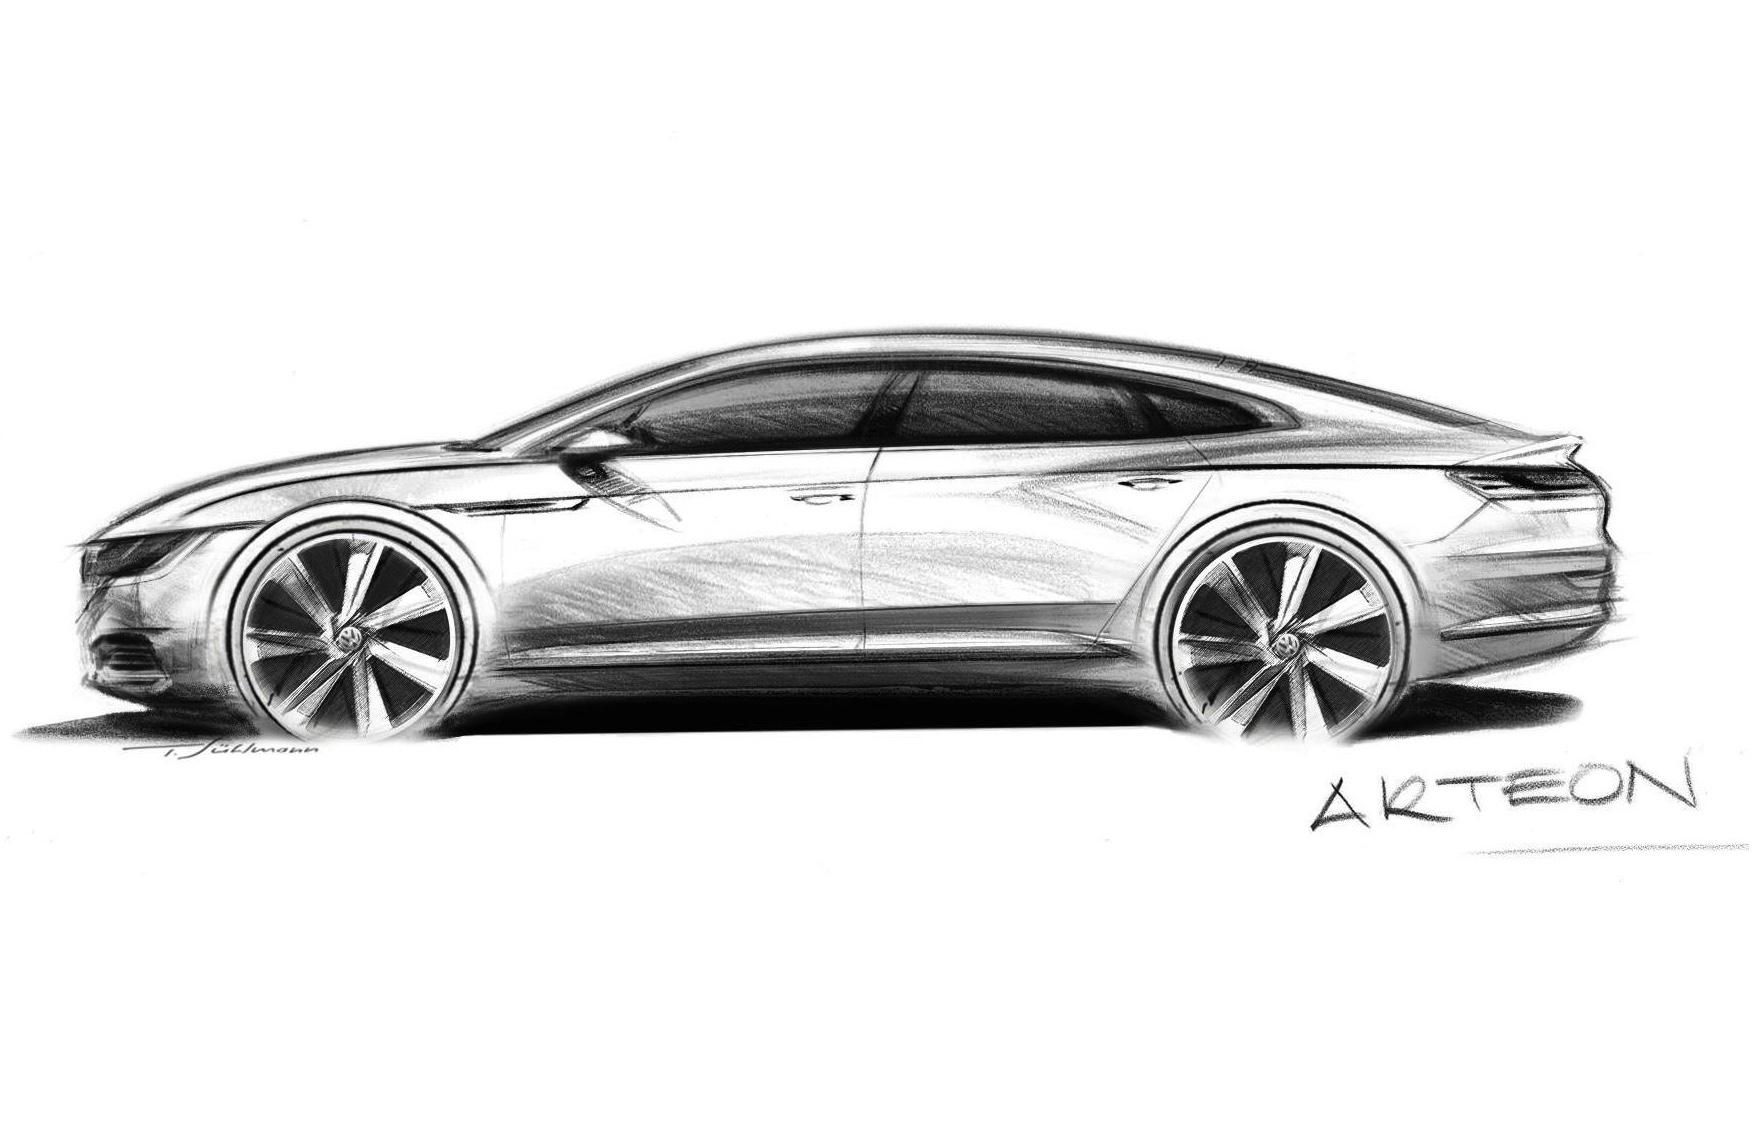 VW's new premium sedan previewed